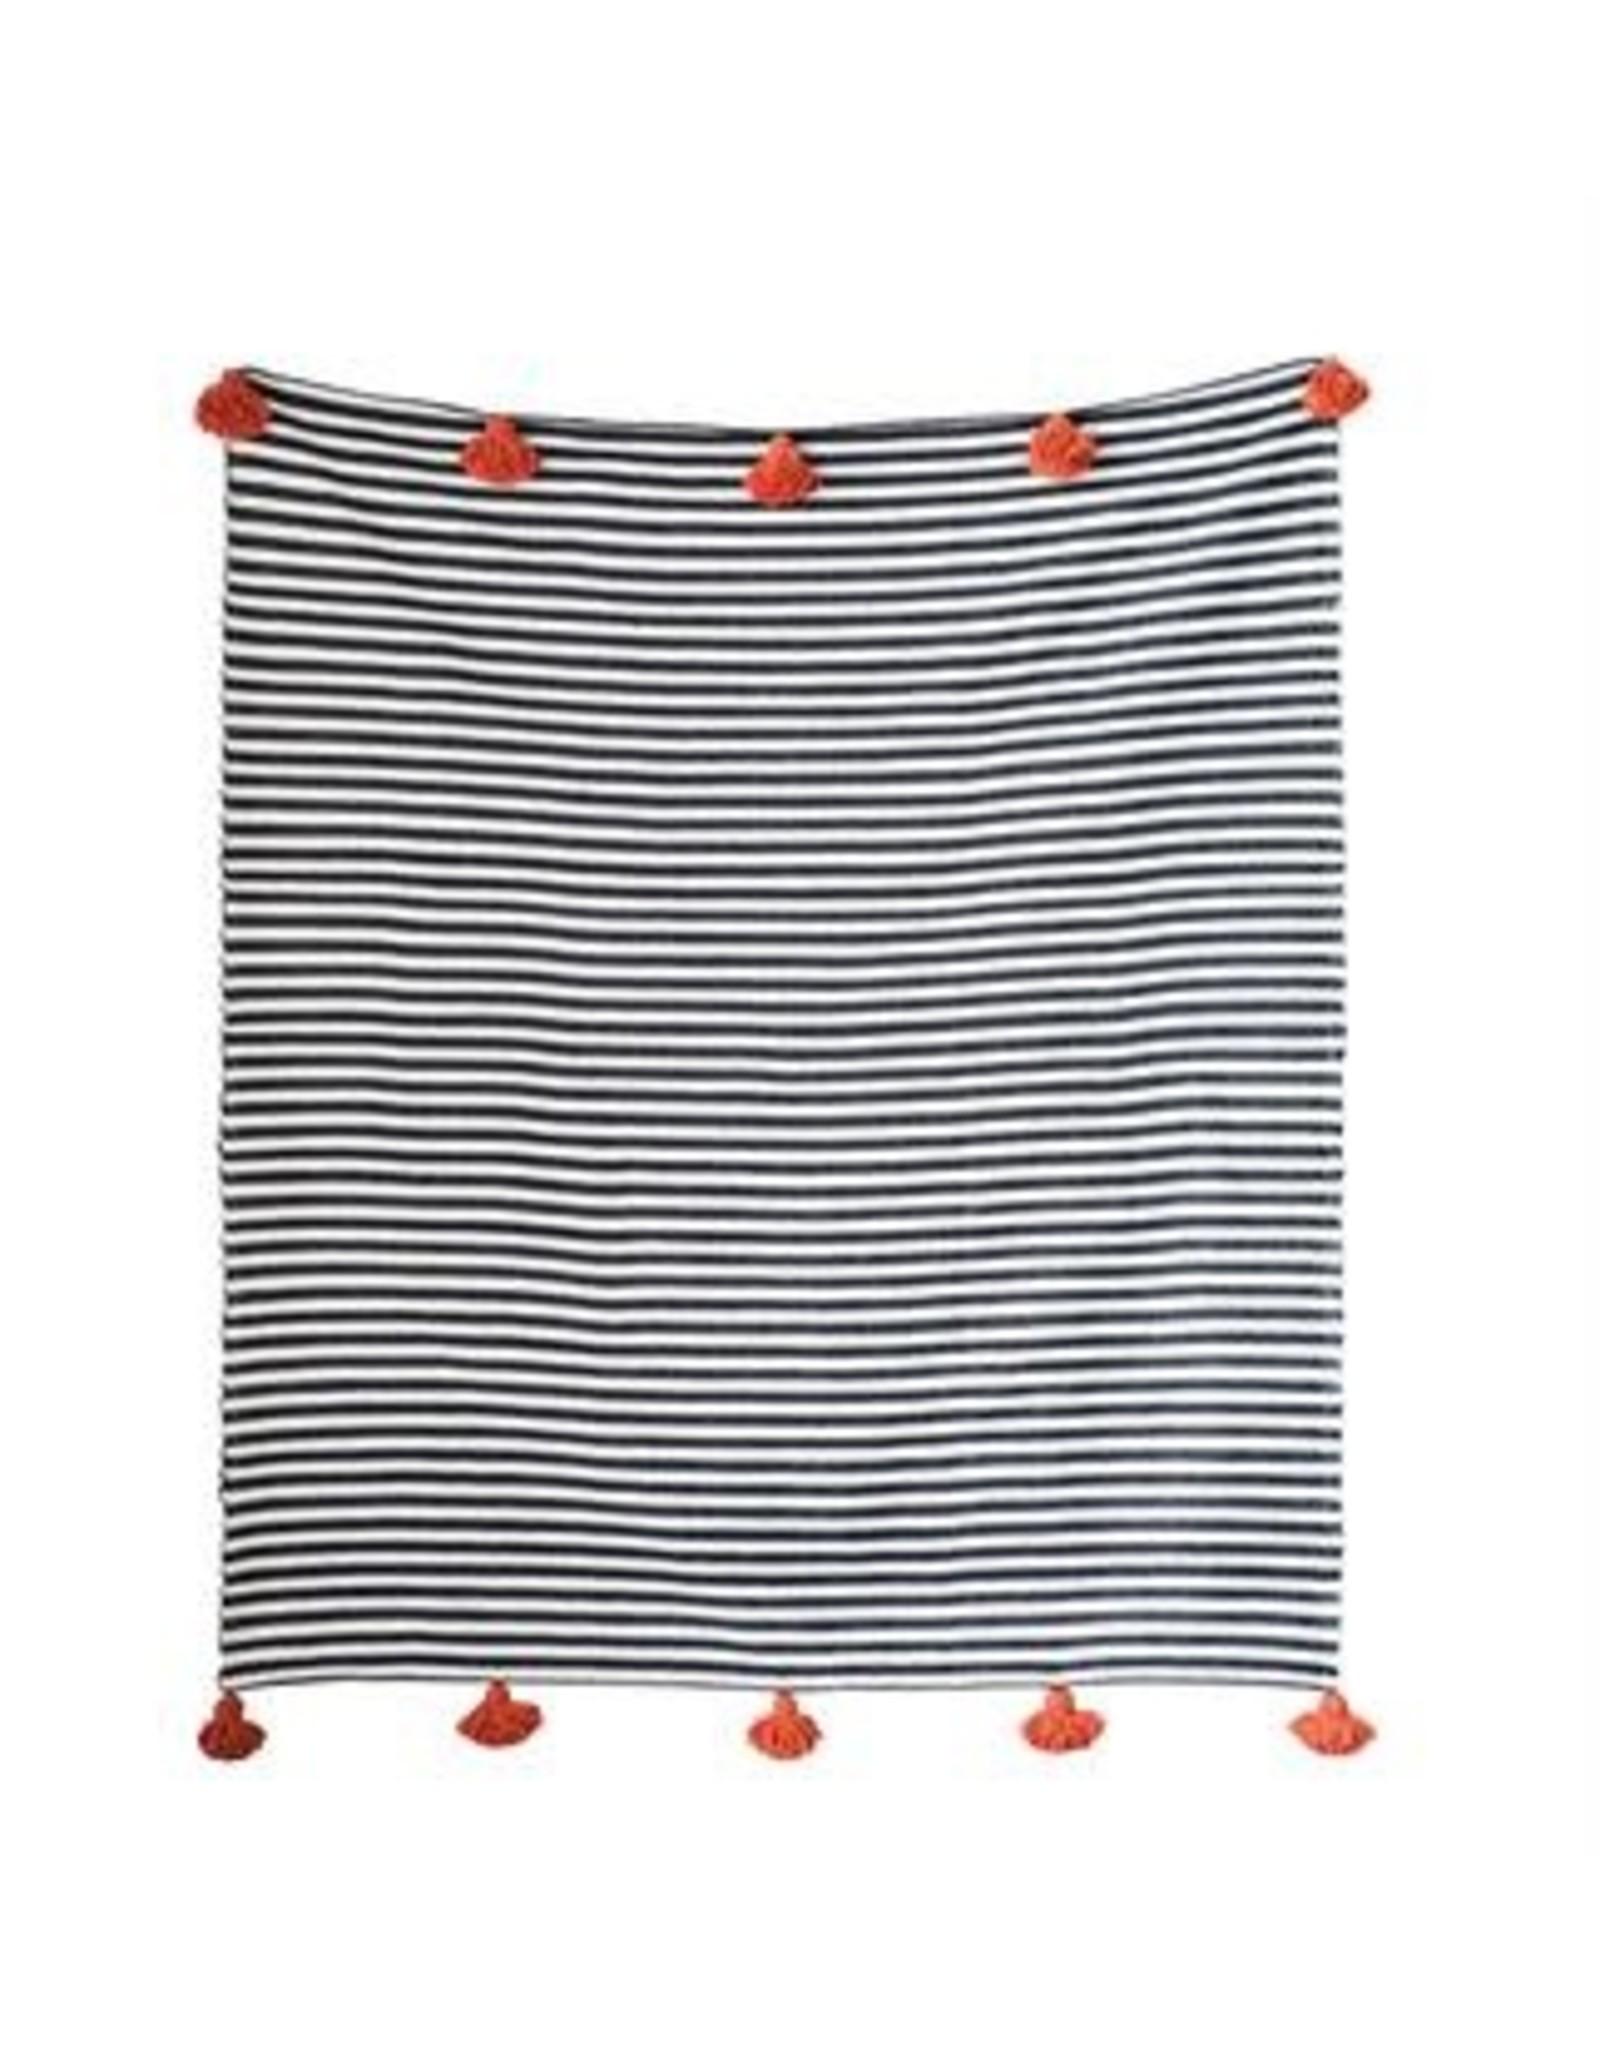 Hand-Loomed Cotton Striped Throw, Black w/ Orange Tassels